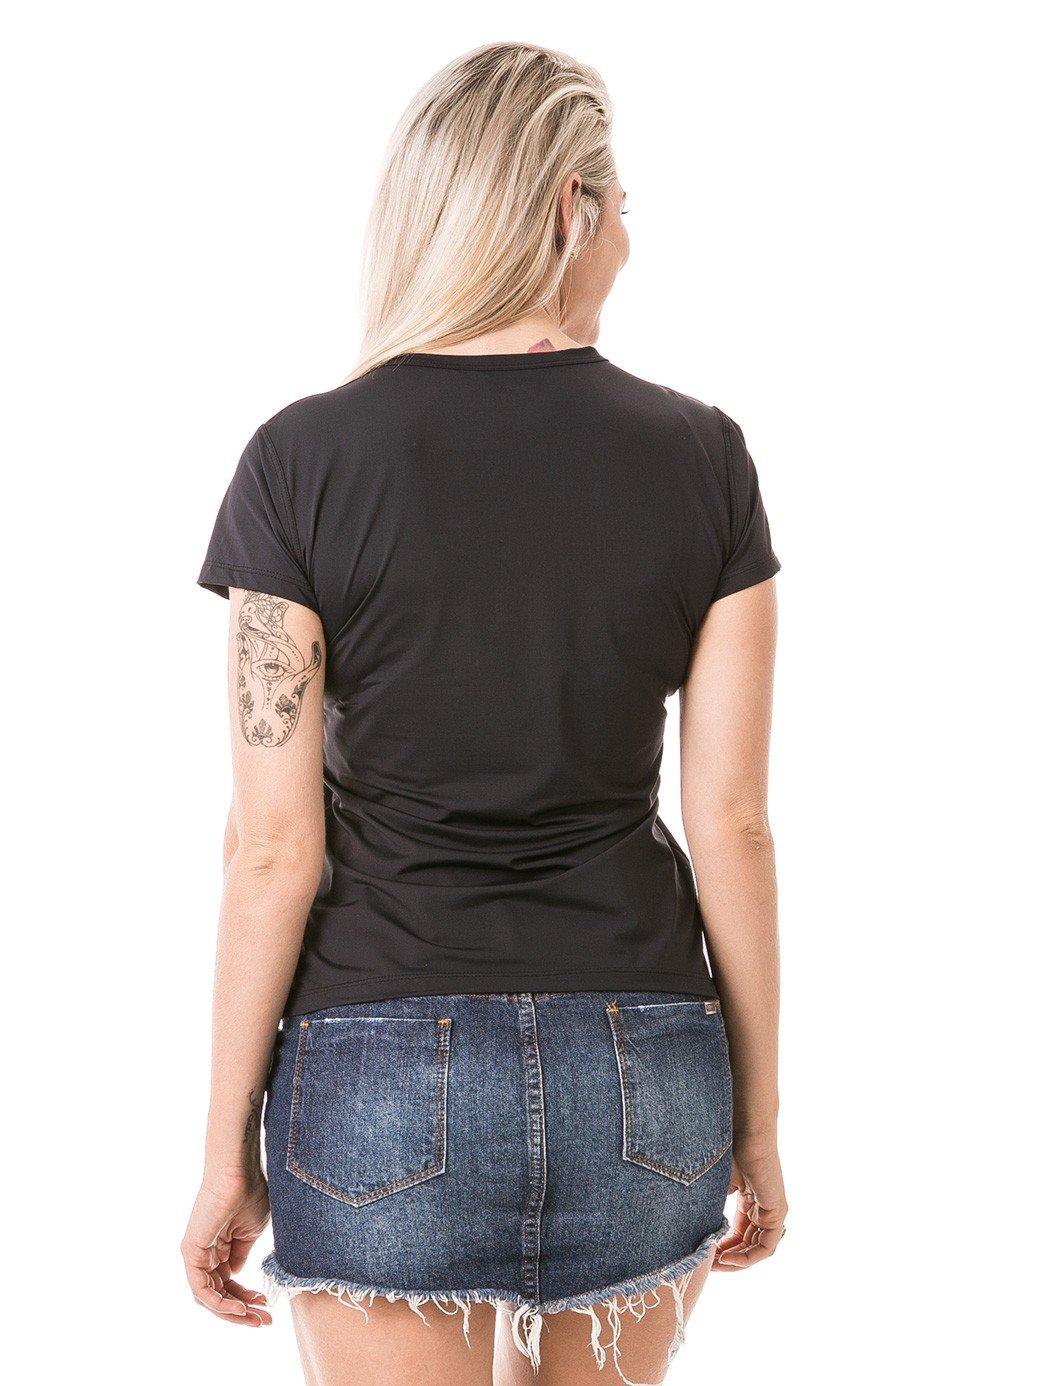 feminia t shirt curta ice preta costas b